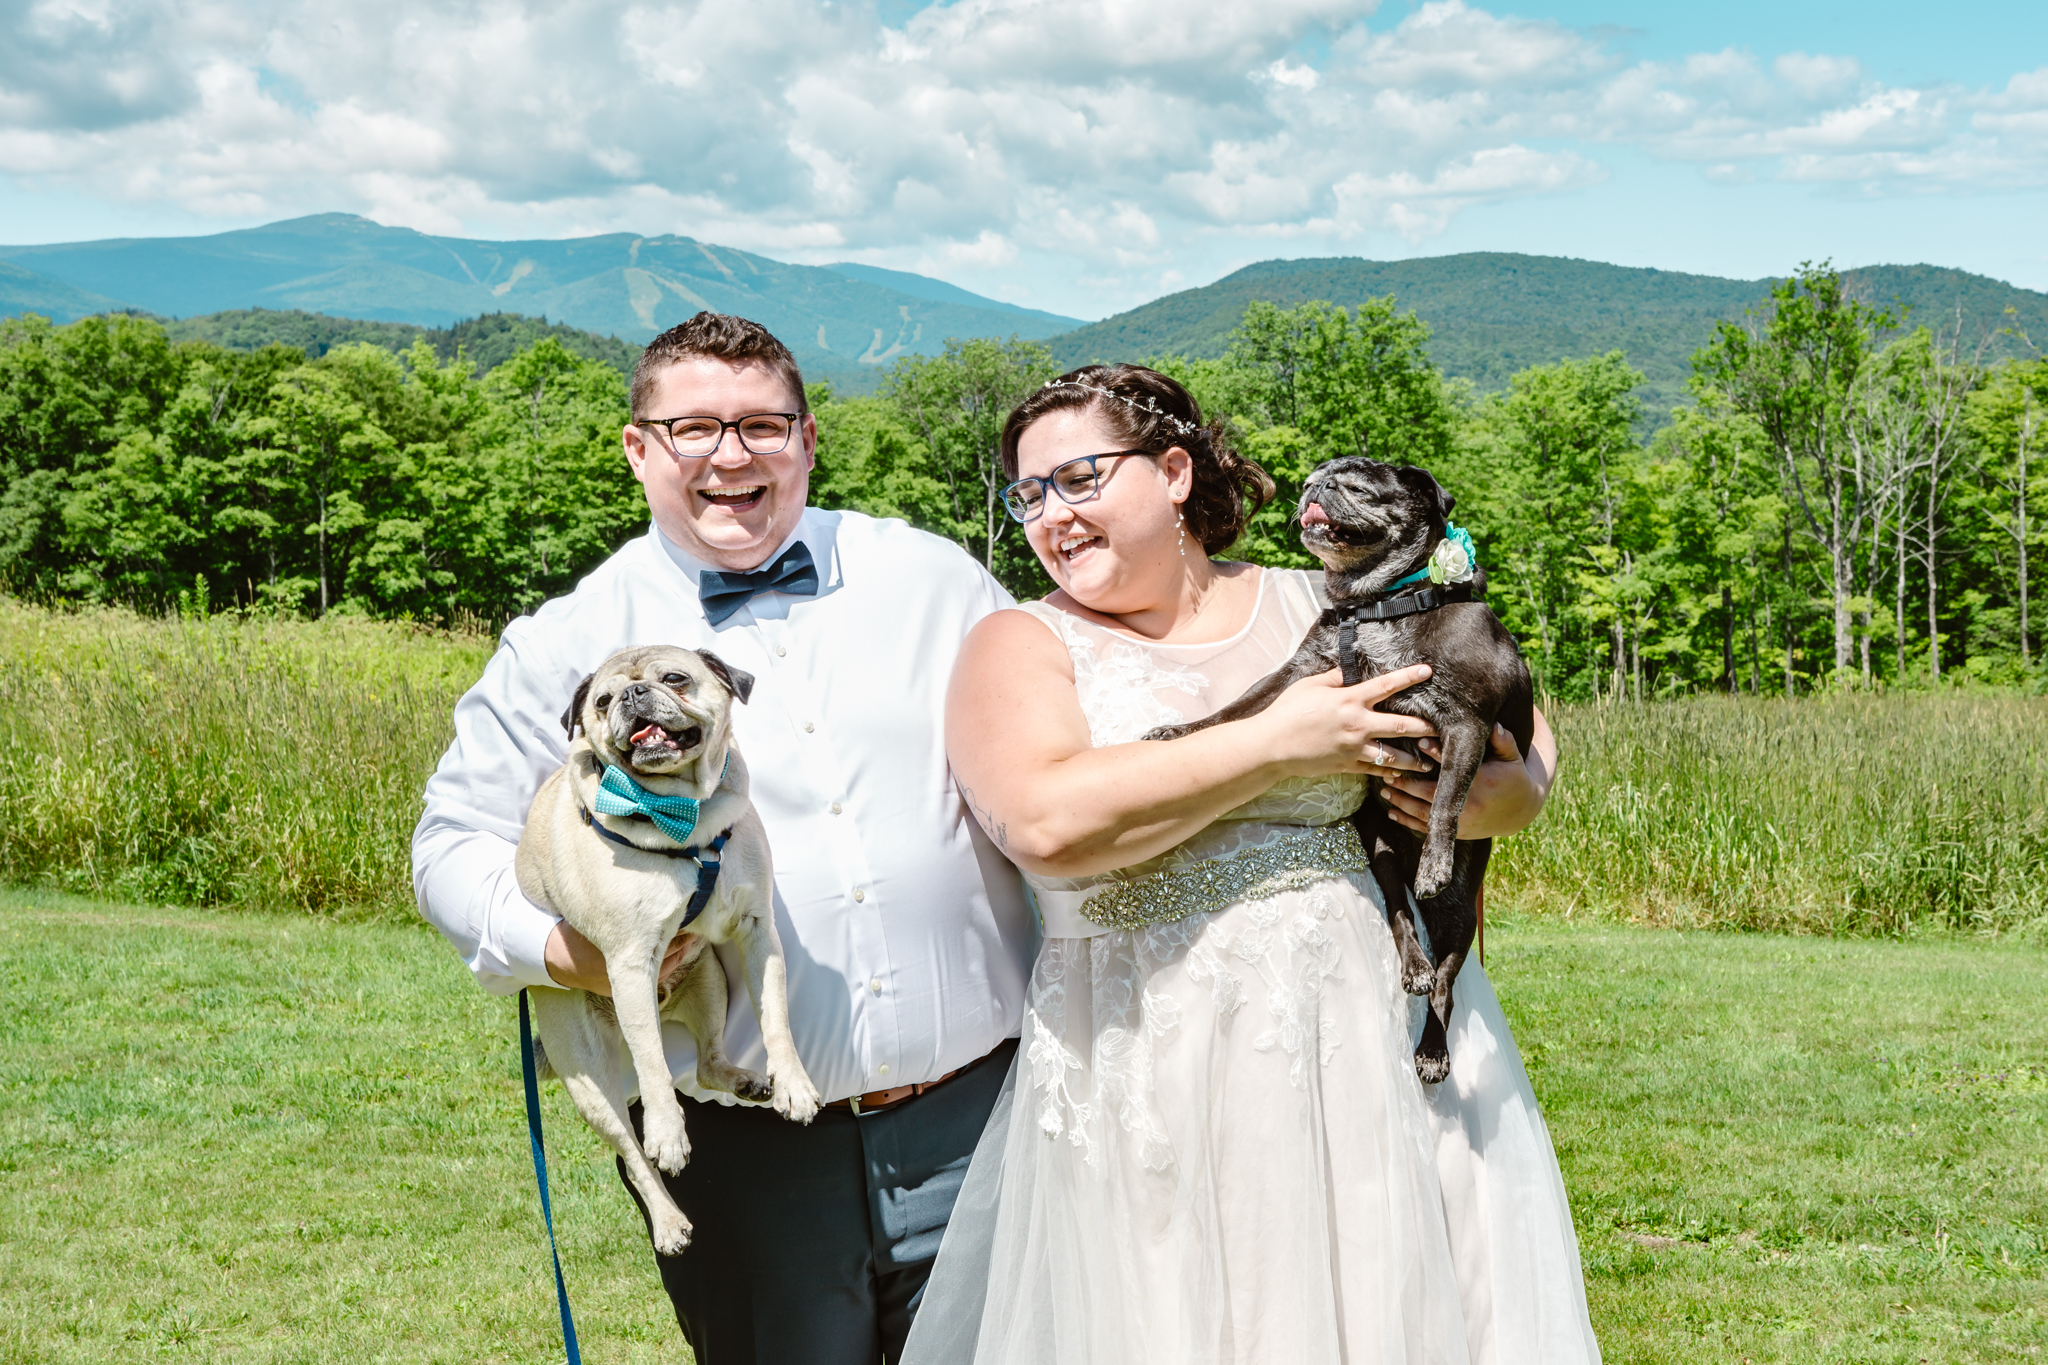 Vermont-Wedding-080119-WEBsize-97.jpg